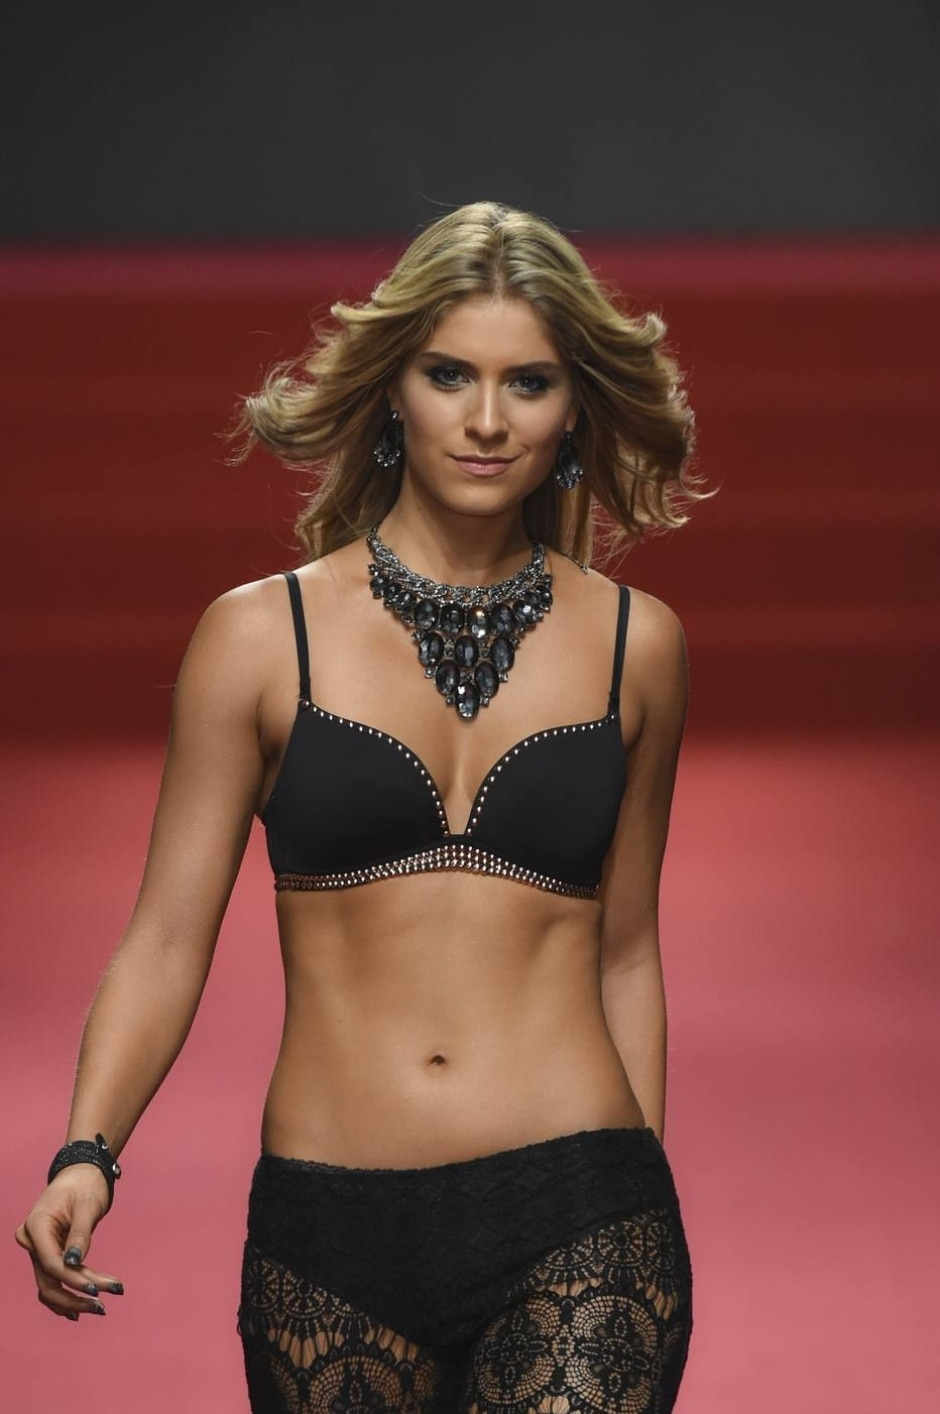 a236f075d Modelos mais bonitas da Colômbia desfilam para marca de lingeries ...